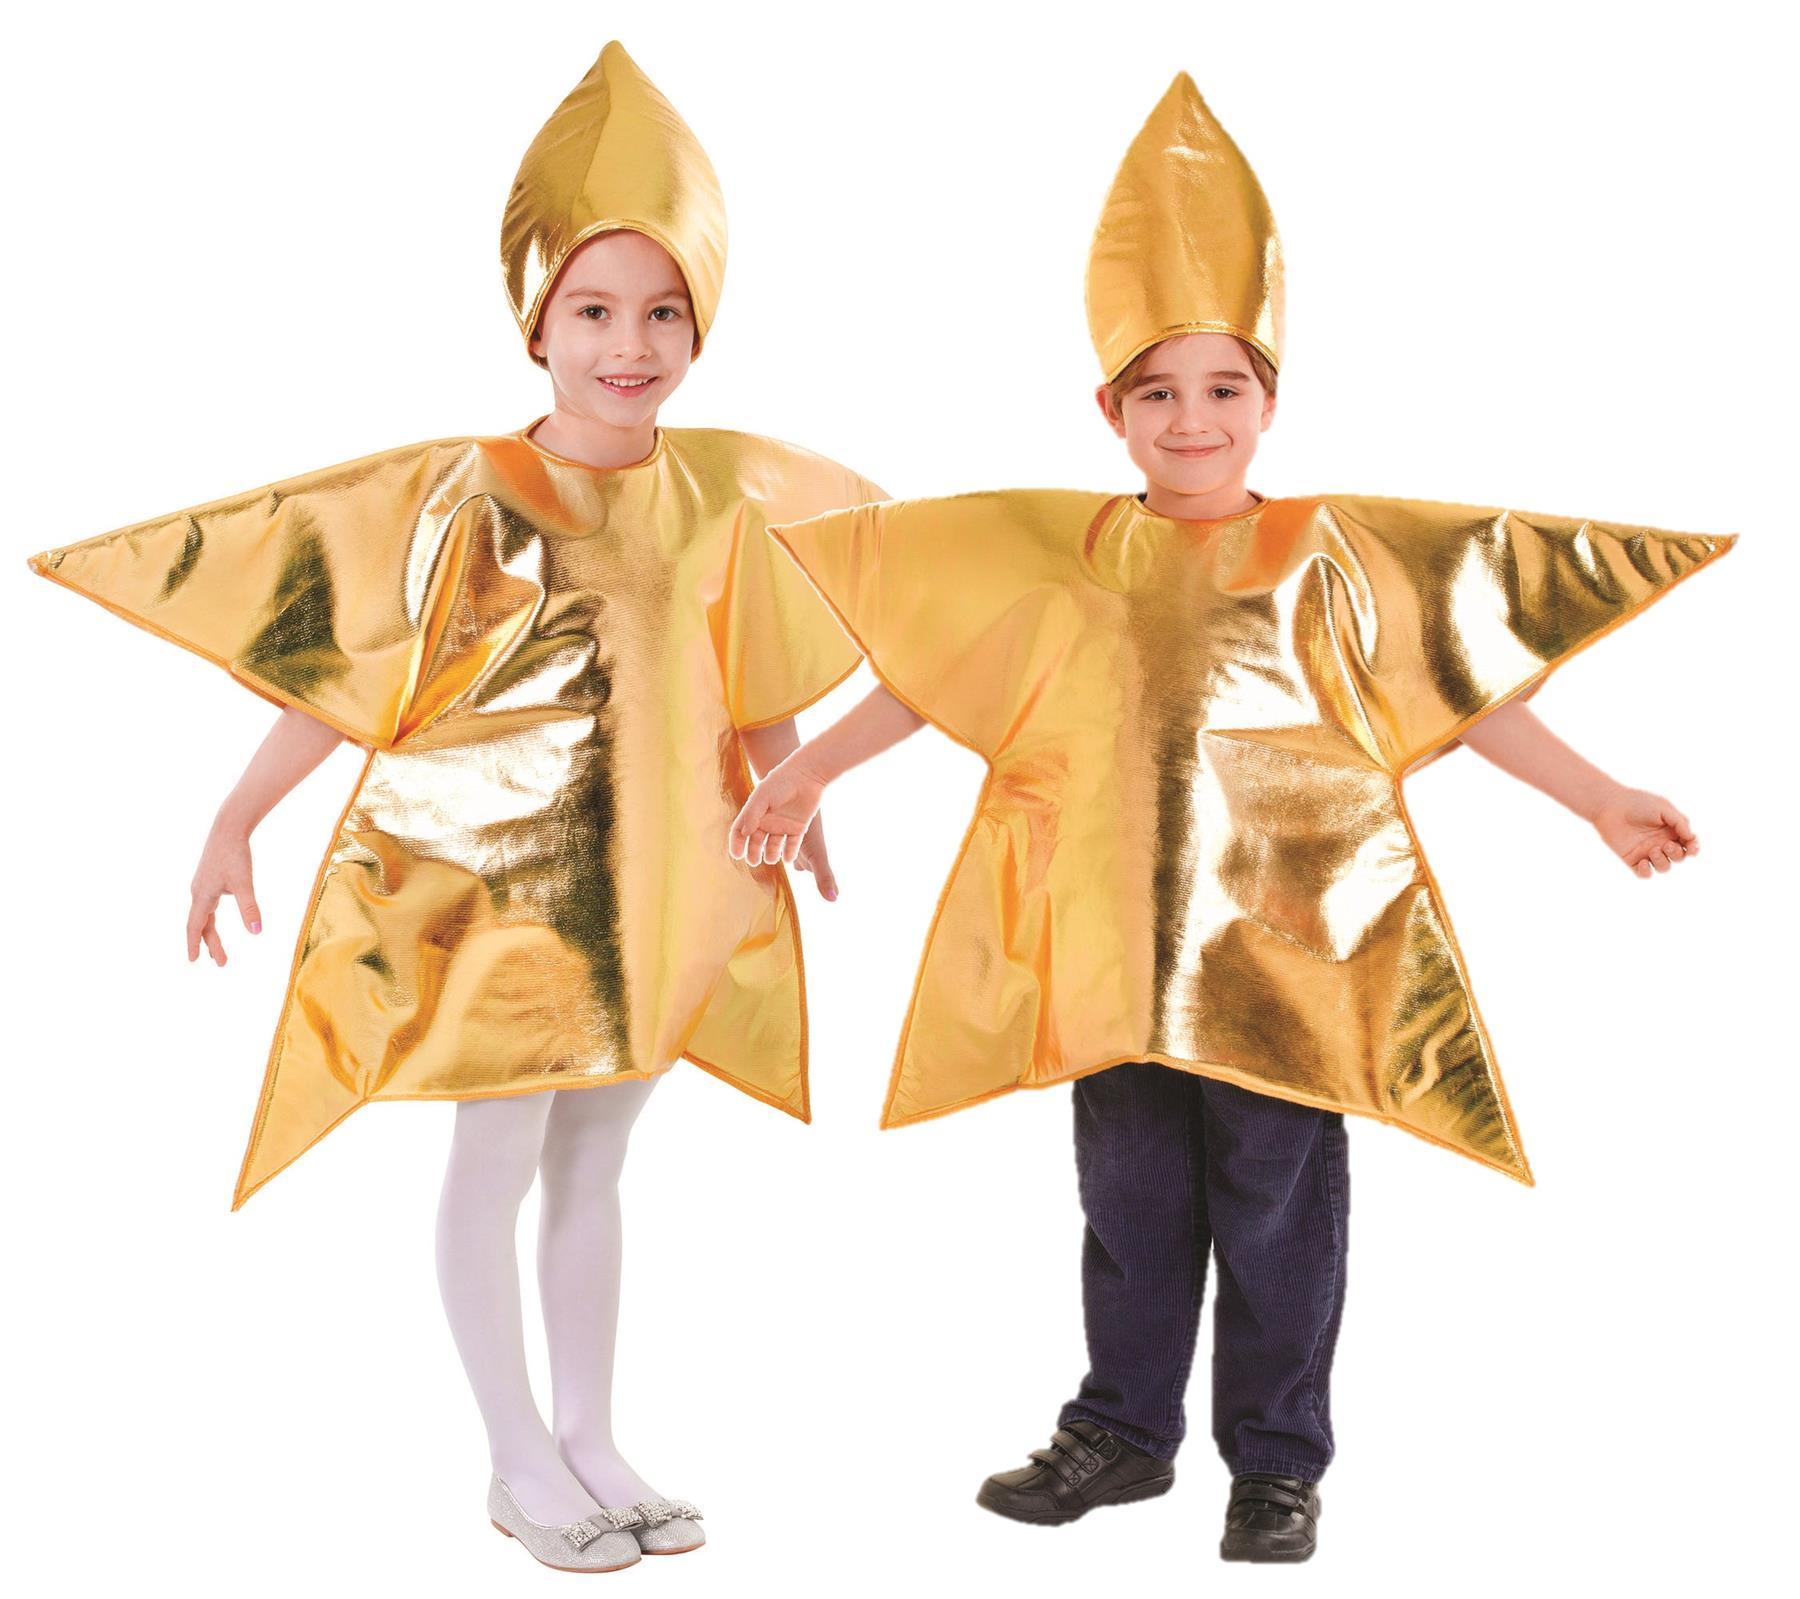 Children Christmas Gold Star Costume Kids Fancy Dress Boys Girls Nativity Outfit